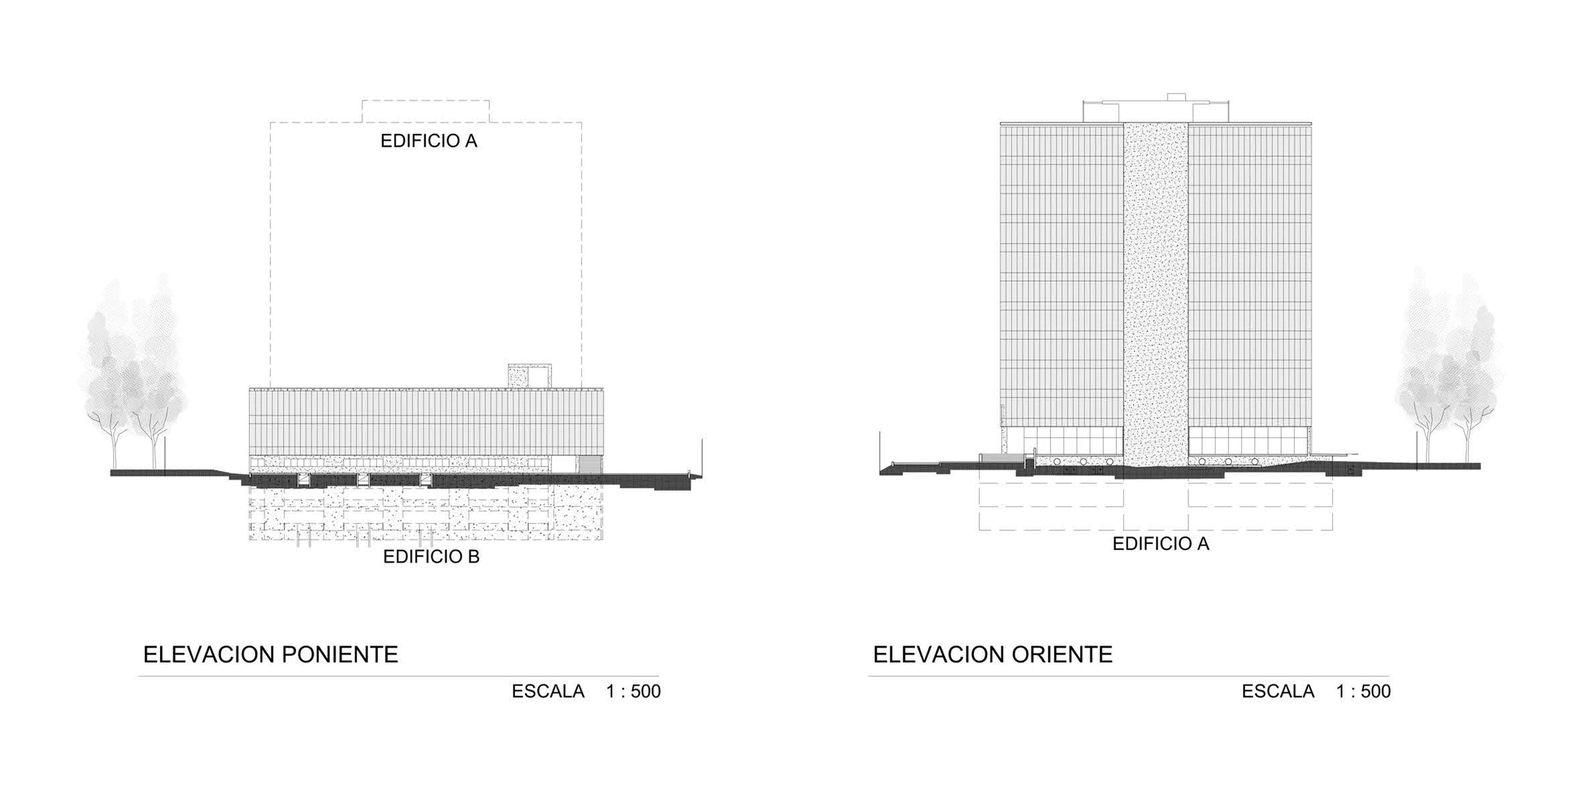 Gallery of Corporative Building Claro Chile / +arquitectos - 21